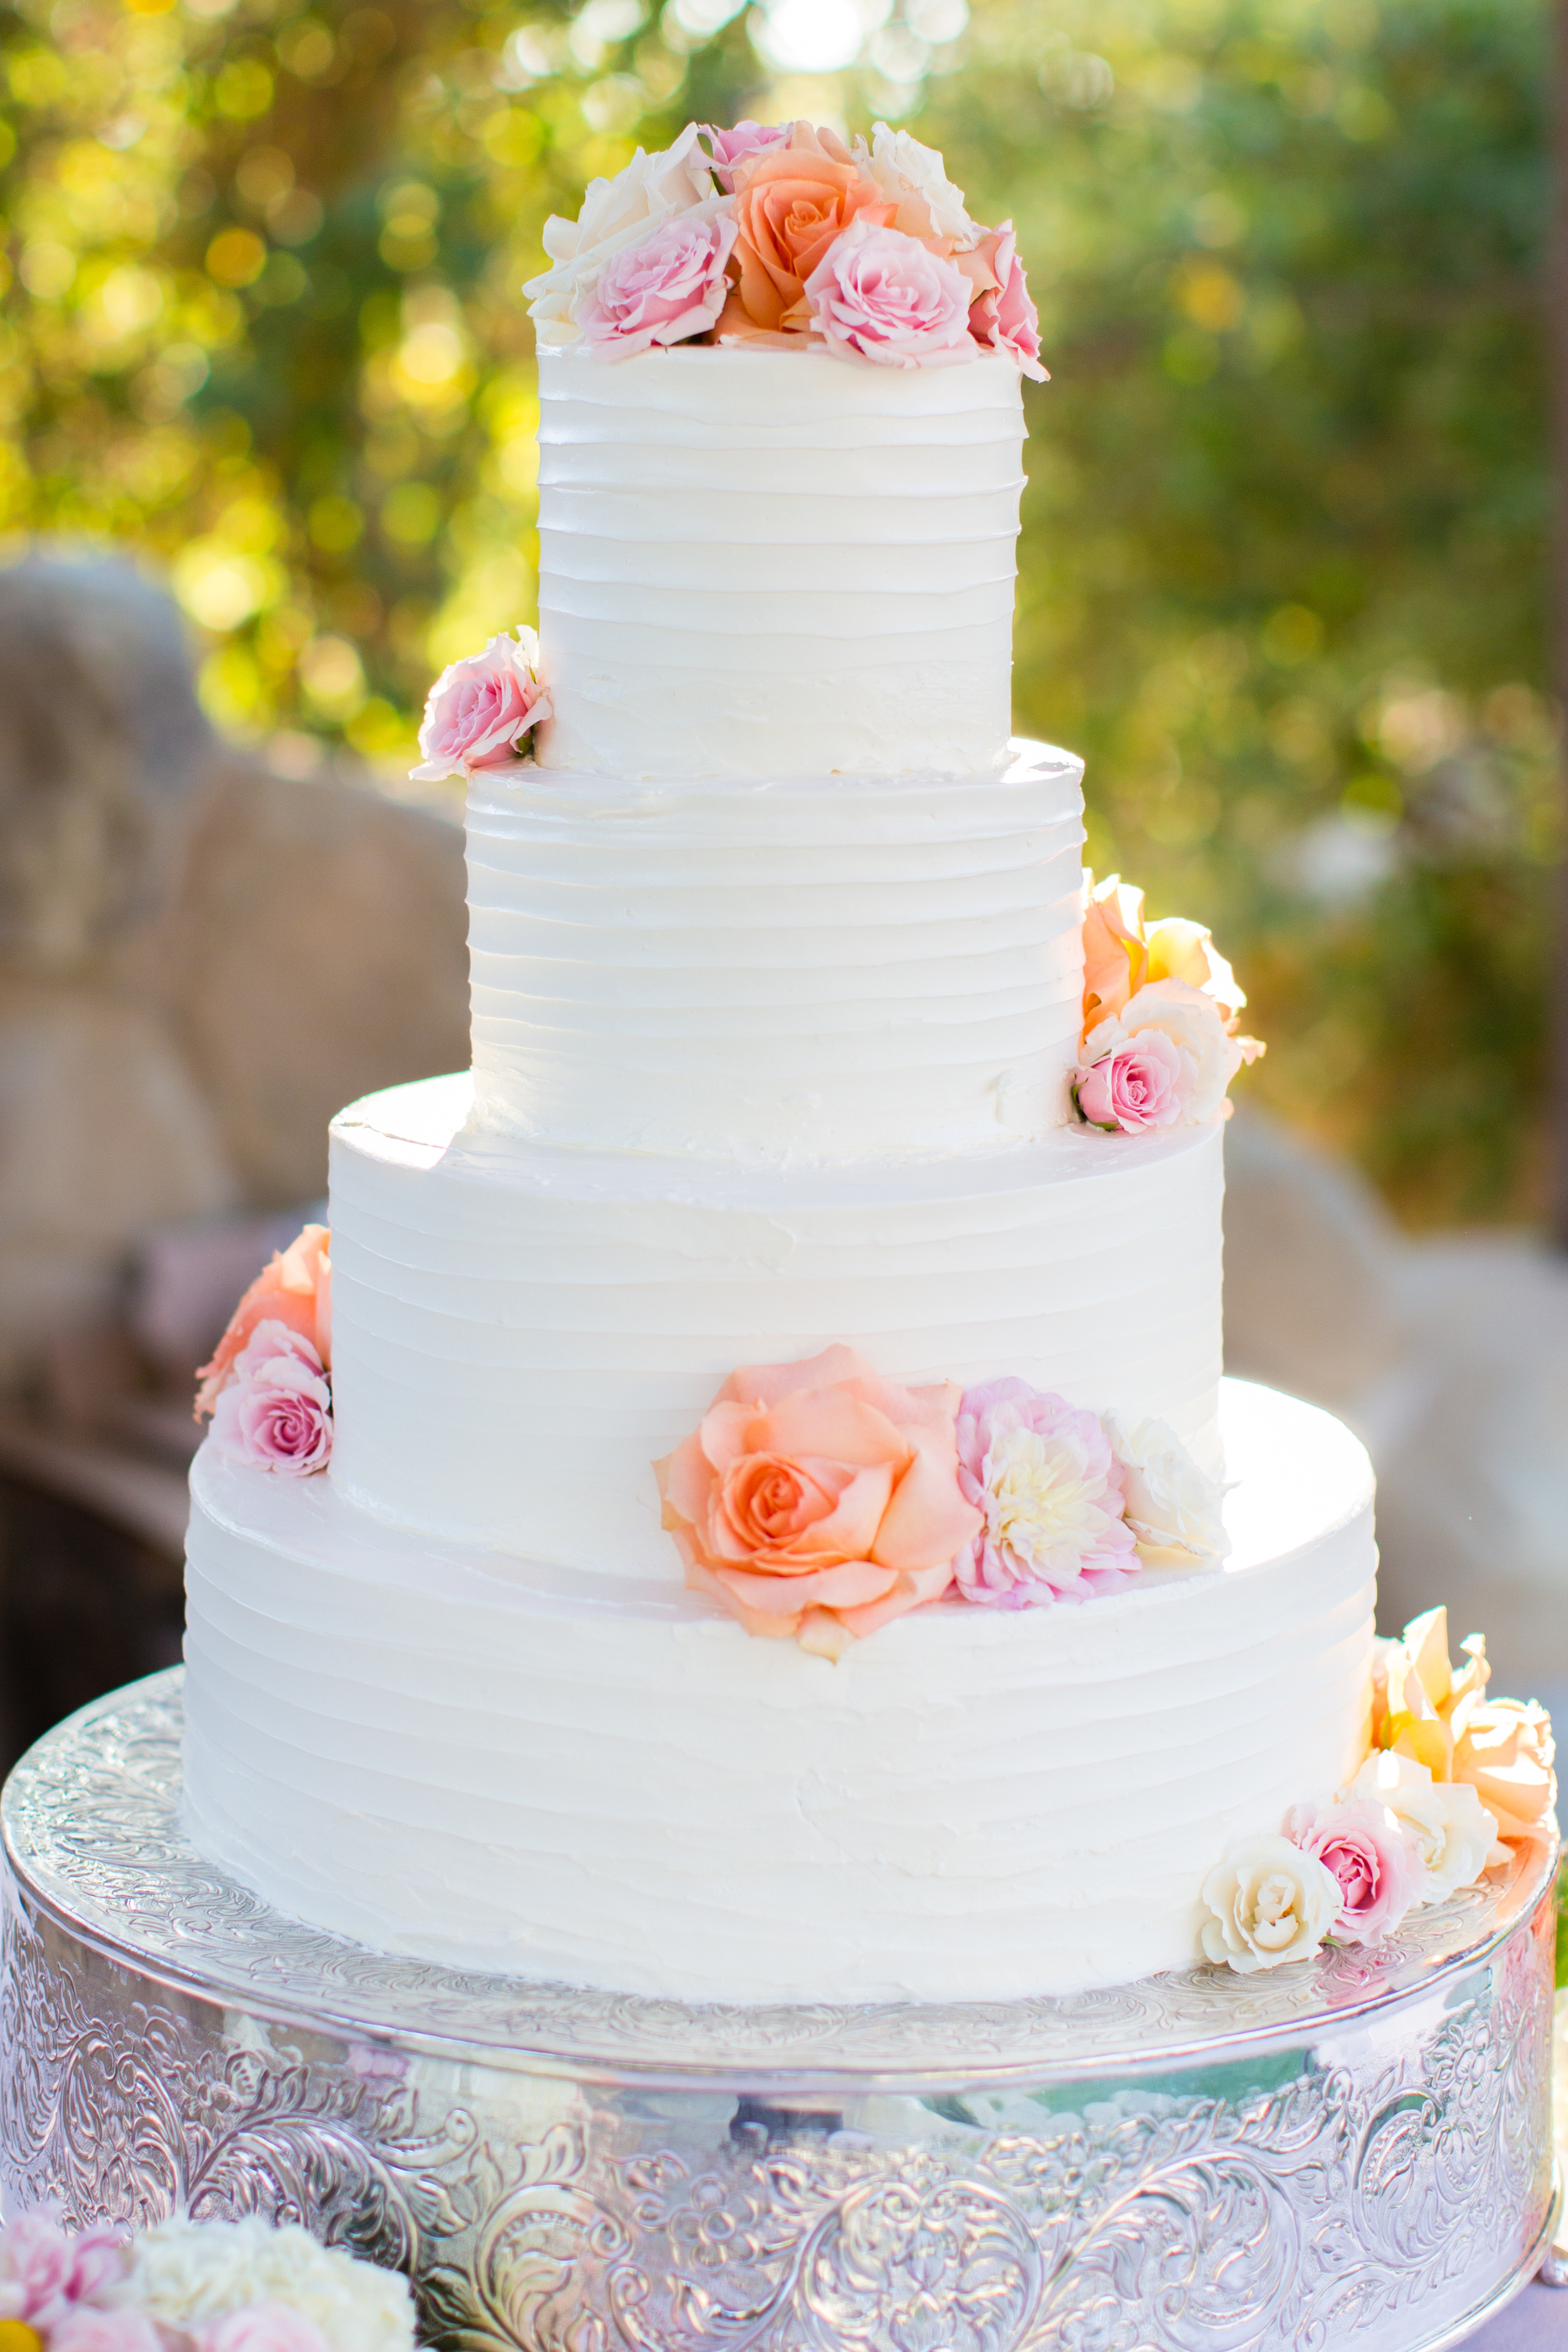 wedding-cake-ventura-ca-pinterest-white-textured-butter-cream-frosting-fresh-flowers